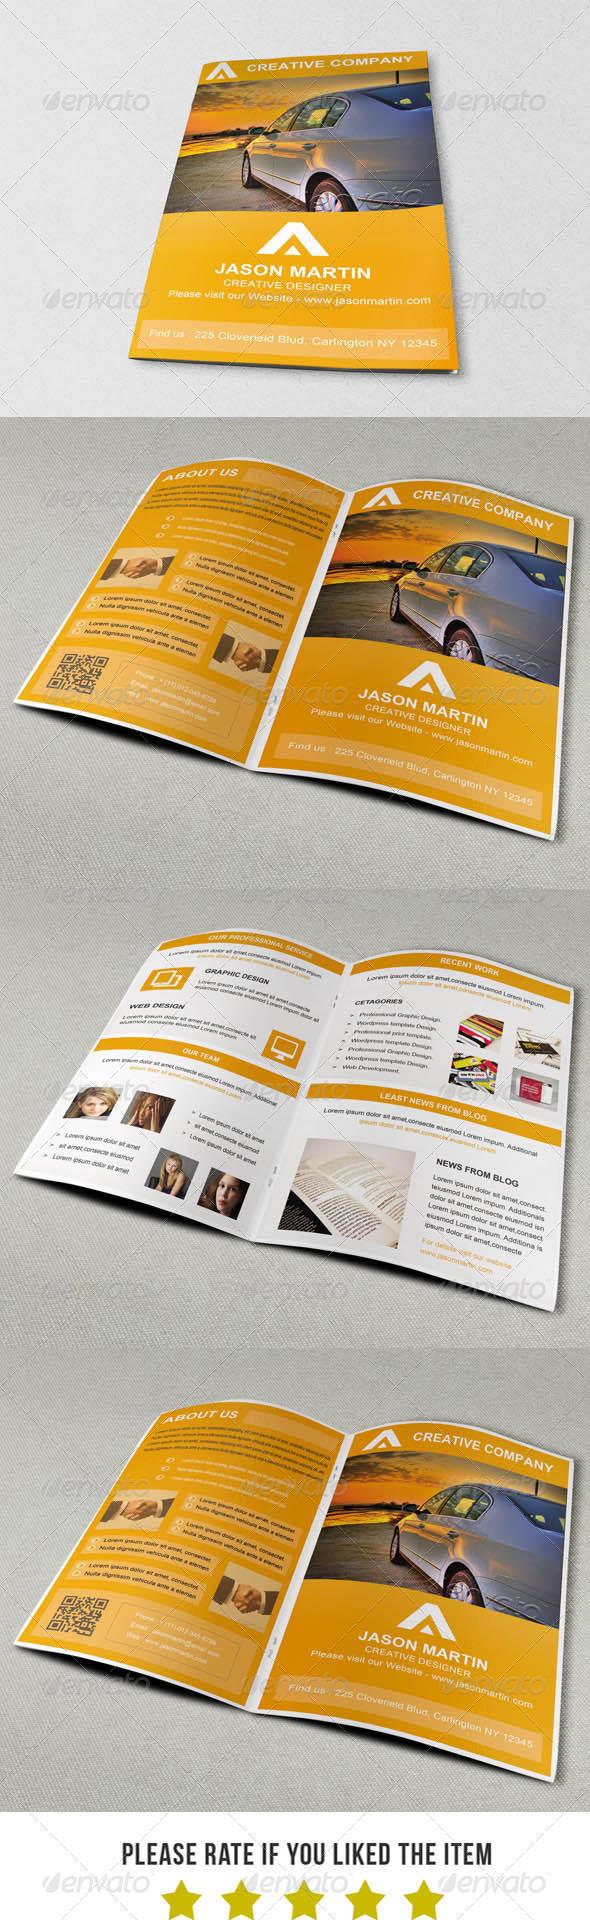 Portfolio Brochure V2 - Portfolio Brochures